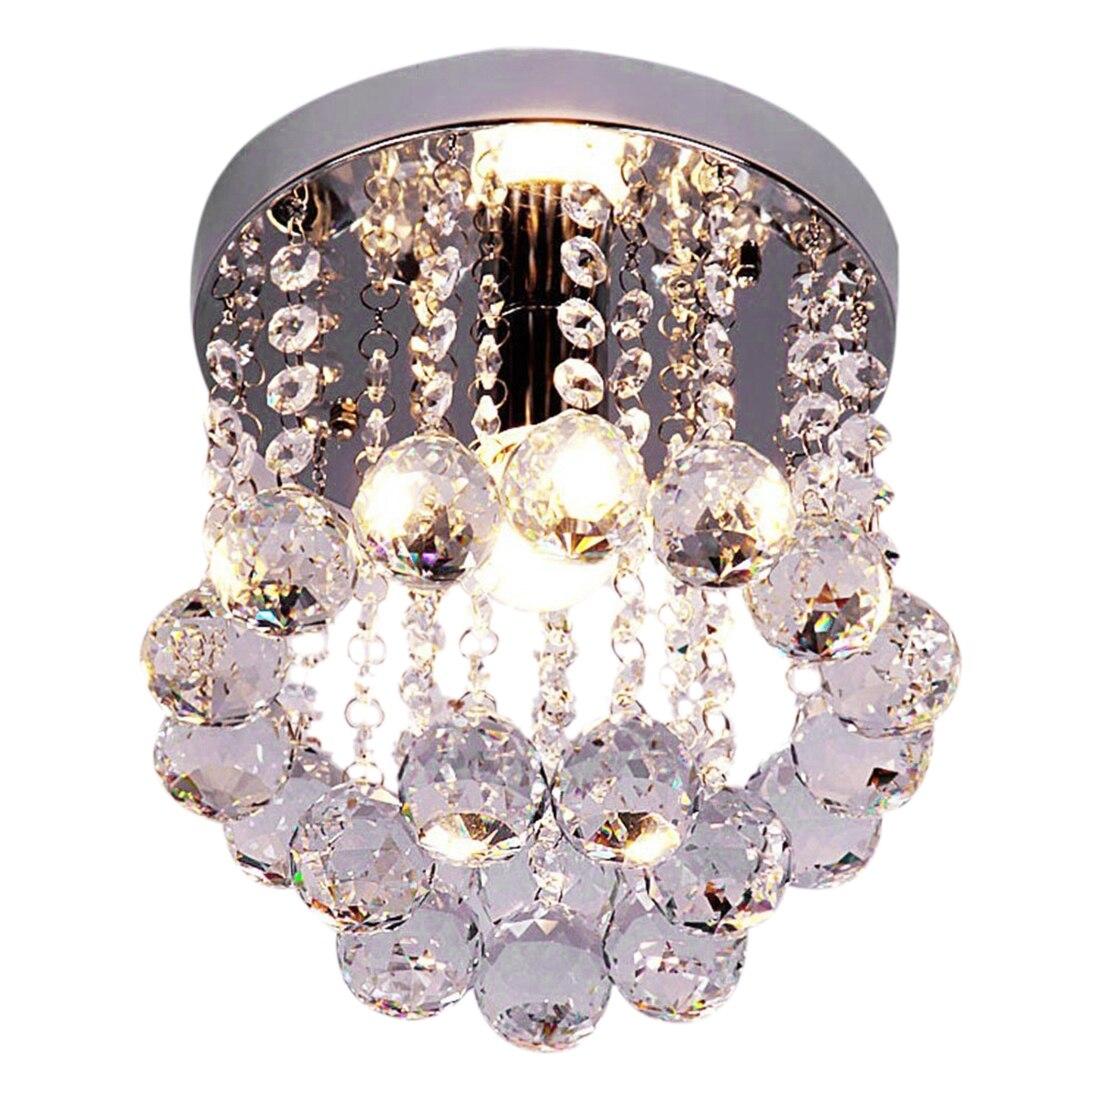 Retro Luxury Flush Mount Crystal Pendant Light HQ